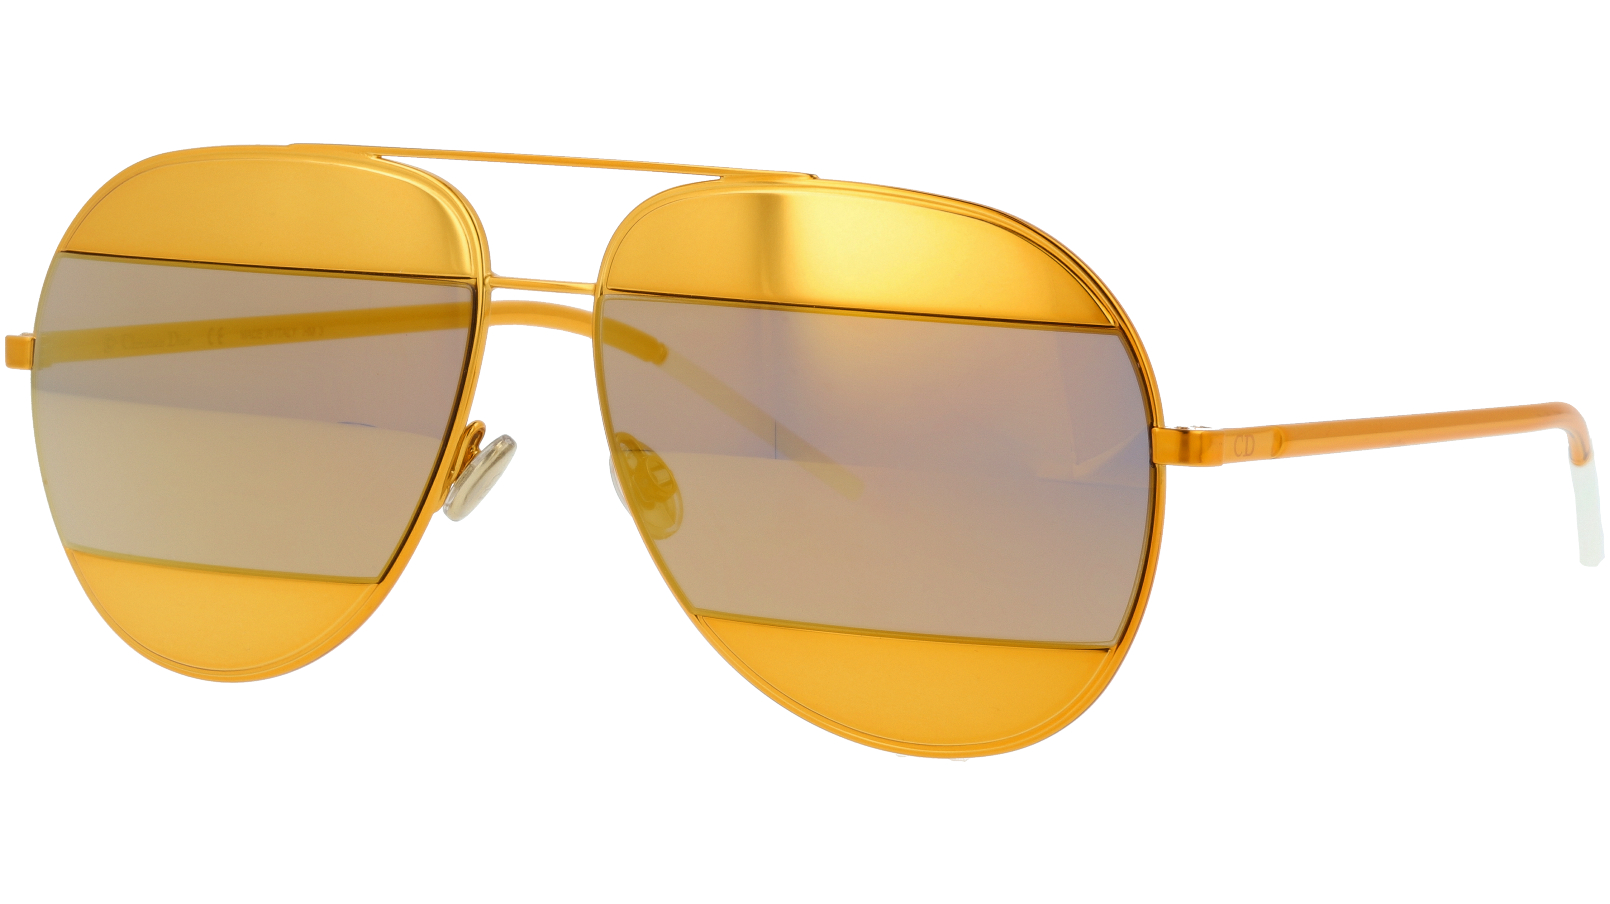 DIOR DIORSPLIT1 1VTSQ 59 YELLOW Sunglasses